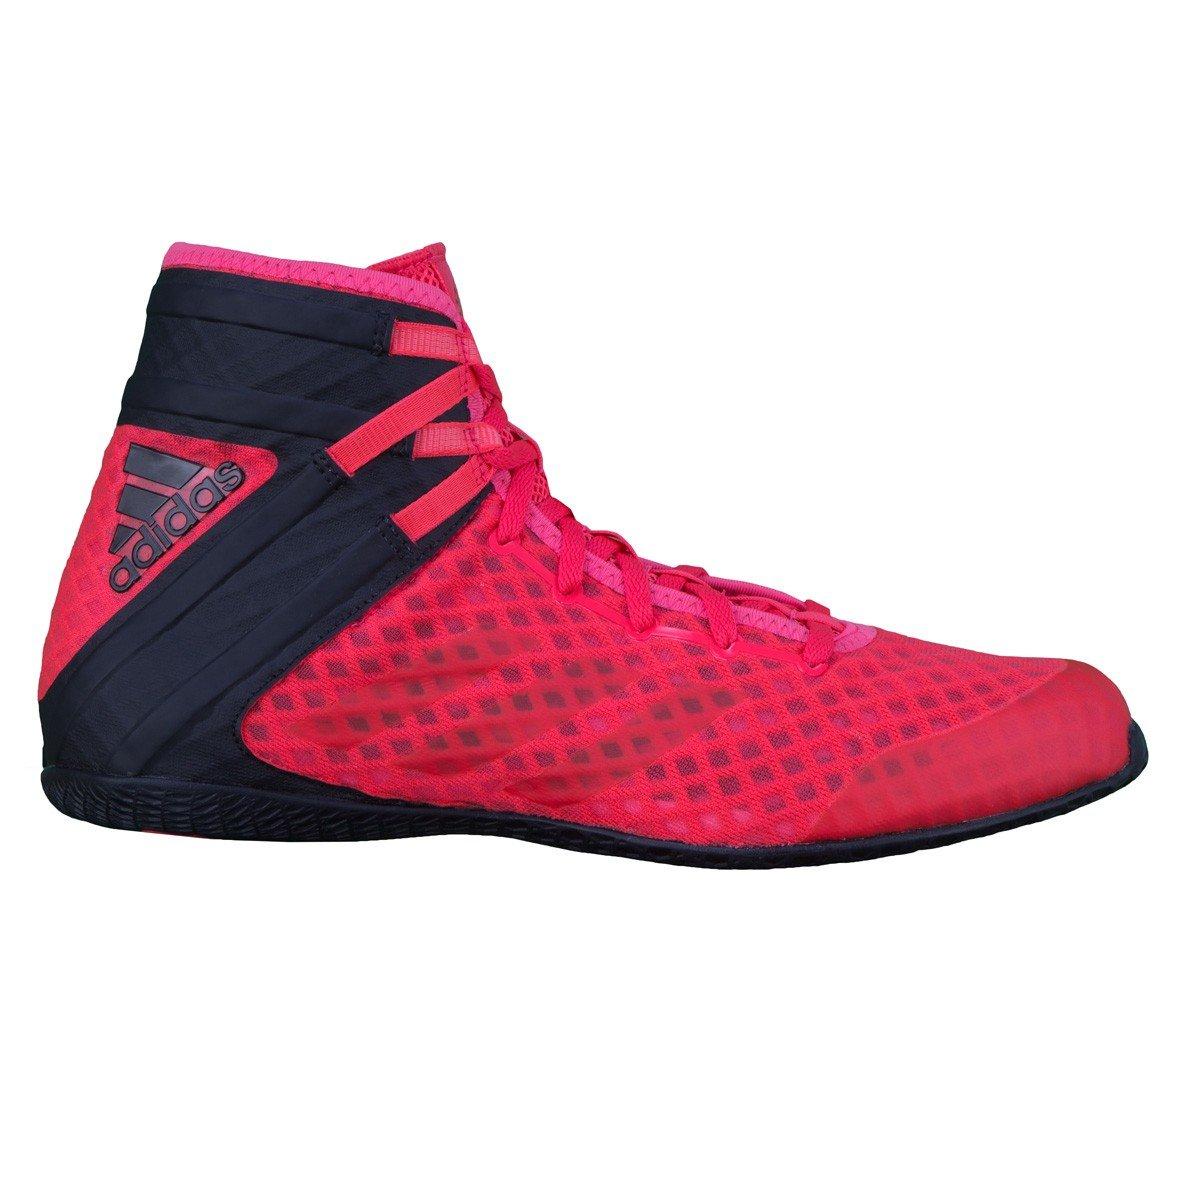 adidas Speedex 16.1, Chaussures de Boxe Homme, Noir (Schwarz Cblack/Ngtmet/Silvmt), 46 EU